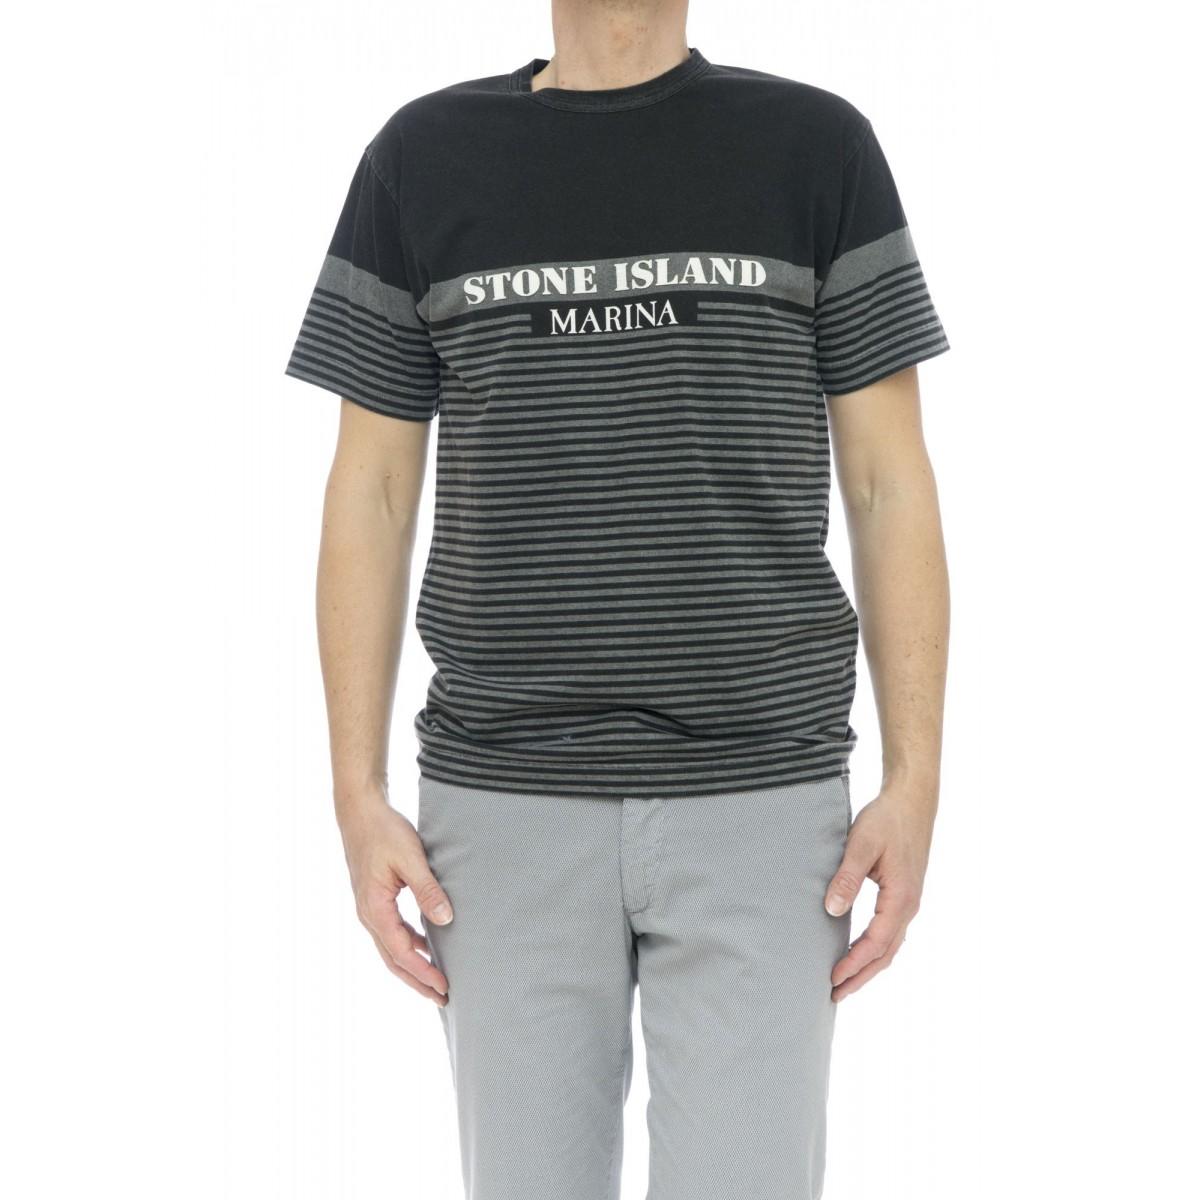 T-shirt - 2nsxg t-shirt marina archivio